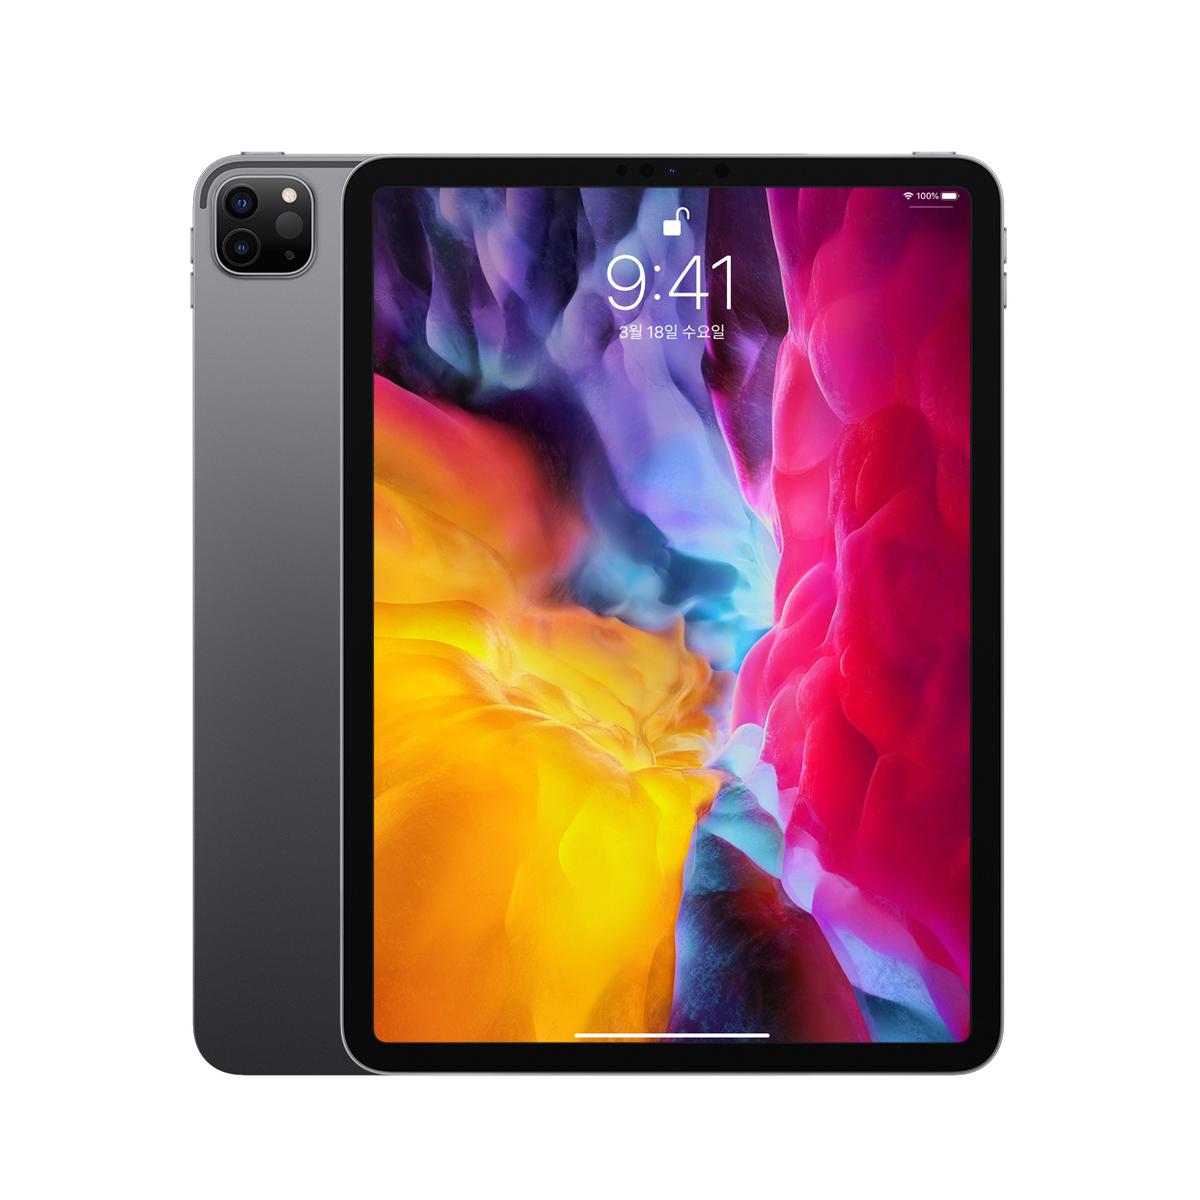 Apple 2020년 iPadPro 11 2세대, Wi-Fi, 128GB, Space Gray